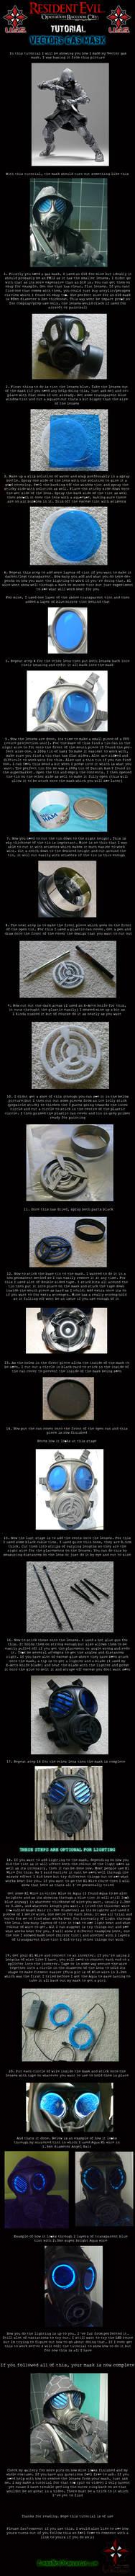 Vector Gas Mask Tutorial by ZombieHunt3r on DeviantArt